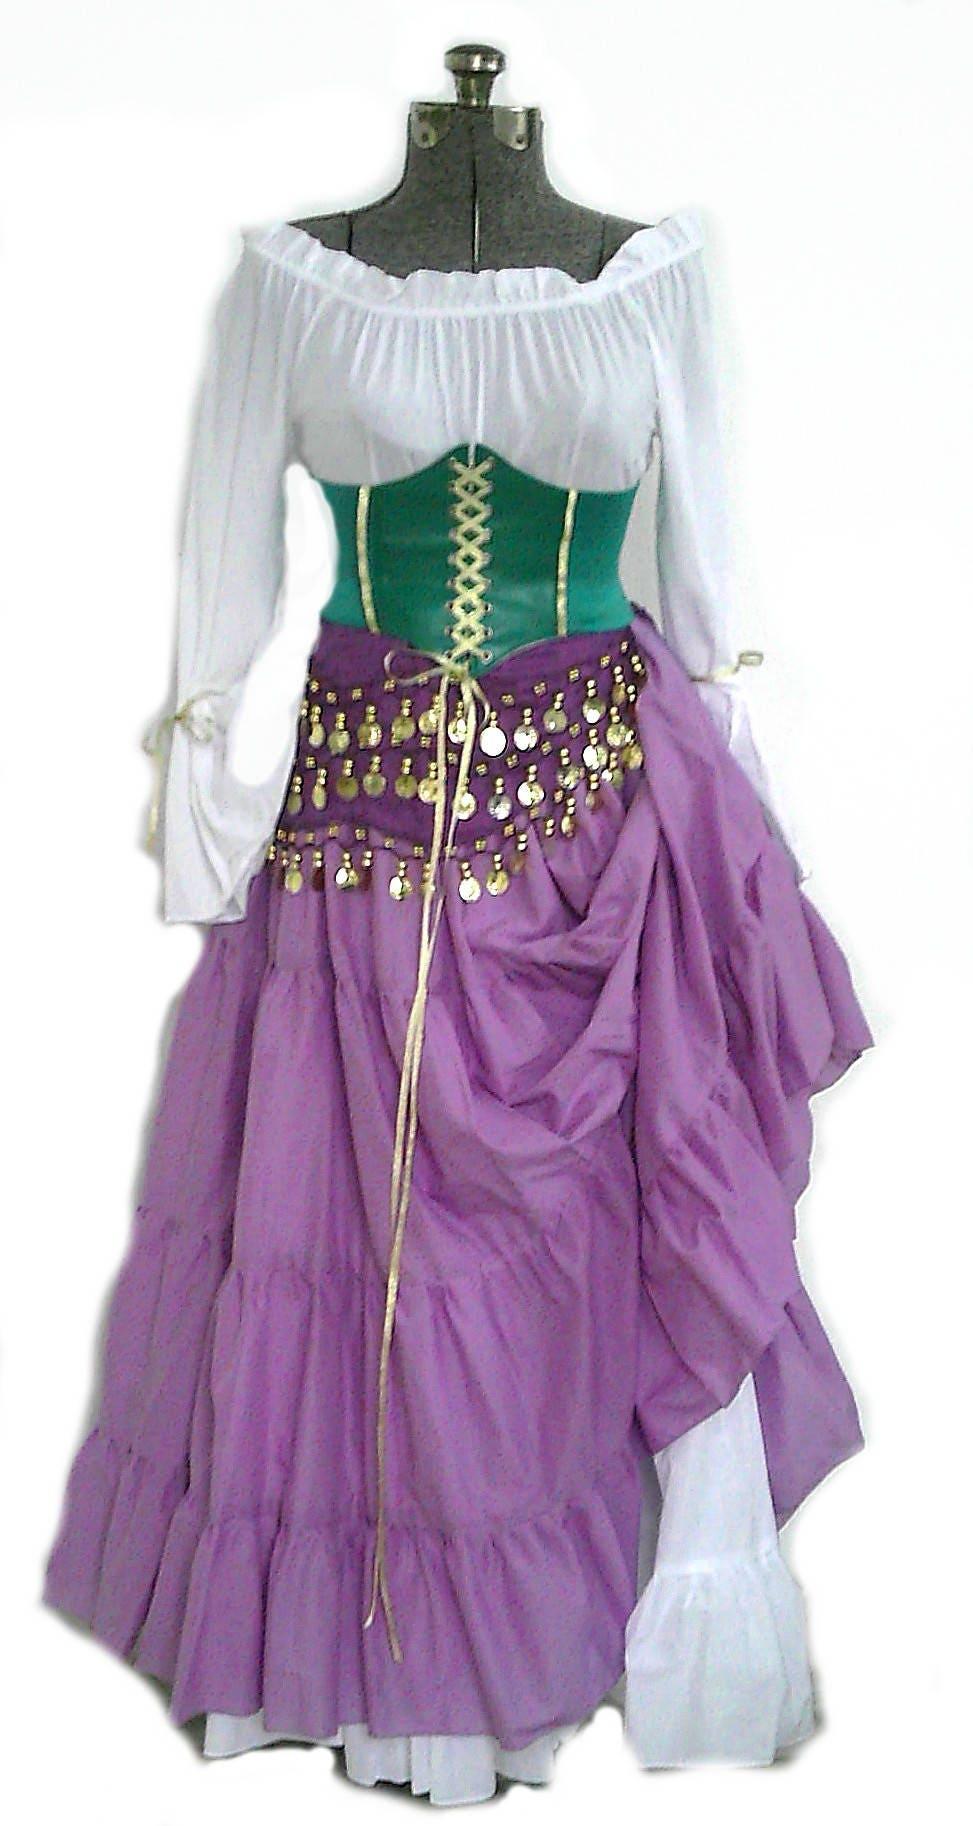 Inspiration & accessories for your DIY Esmeralda halloween ... |Diy Esmeralda Costume